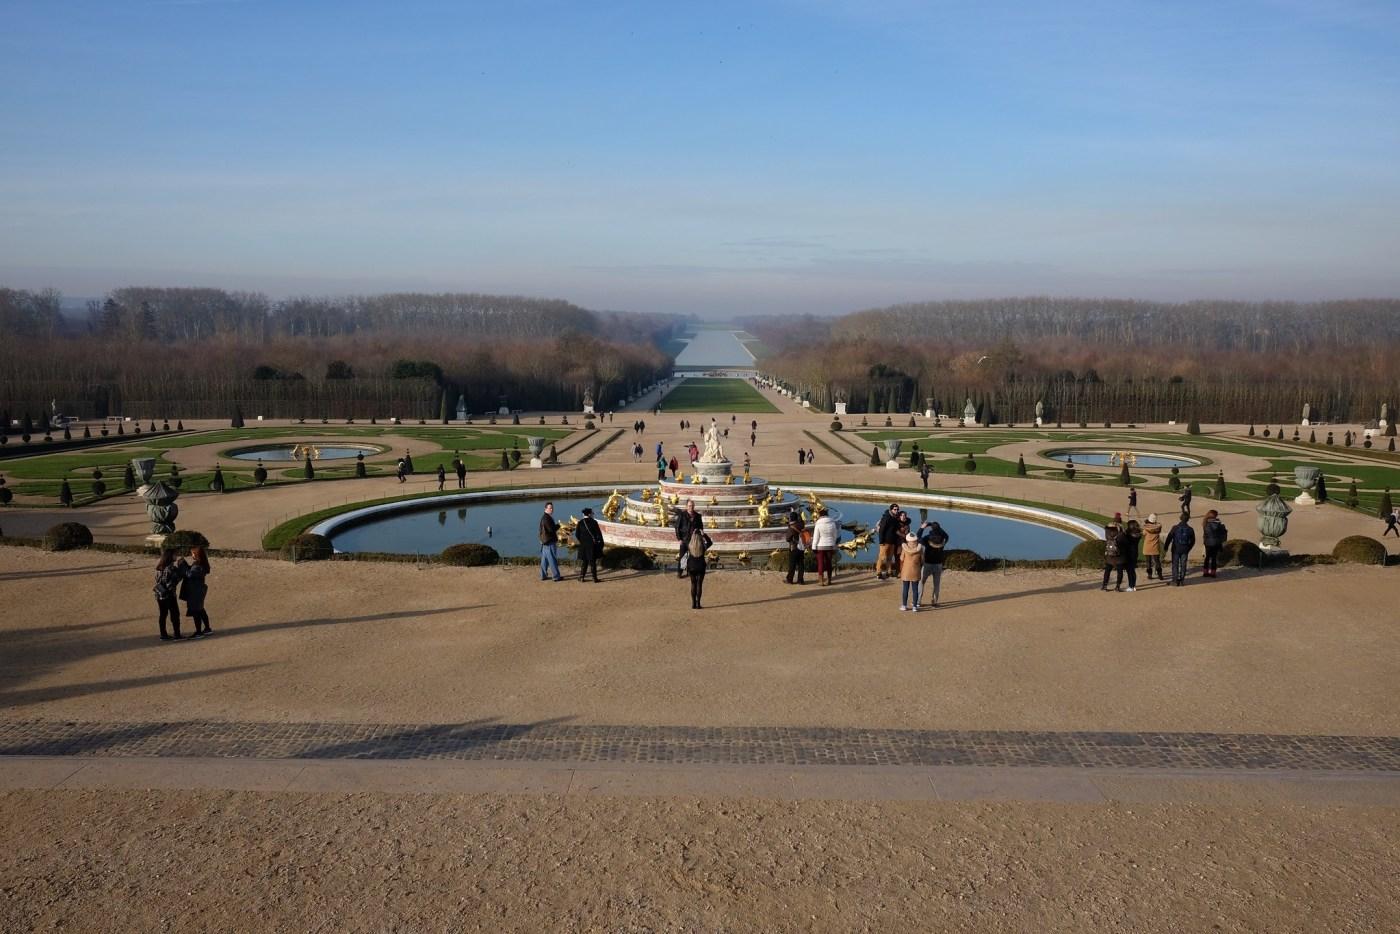 Palace of Versailles Grounds